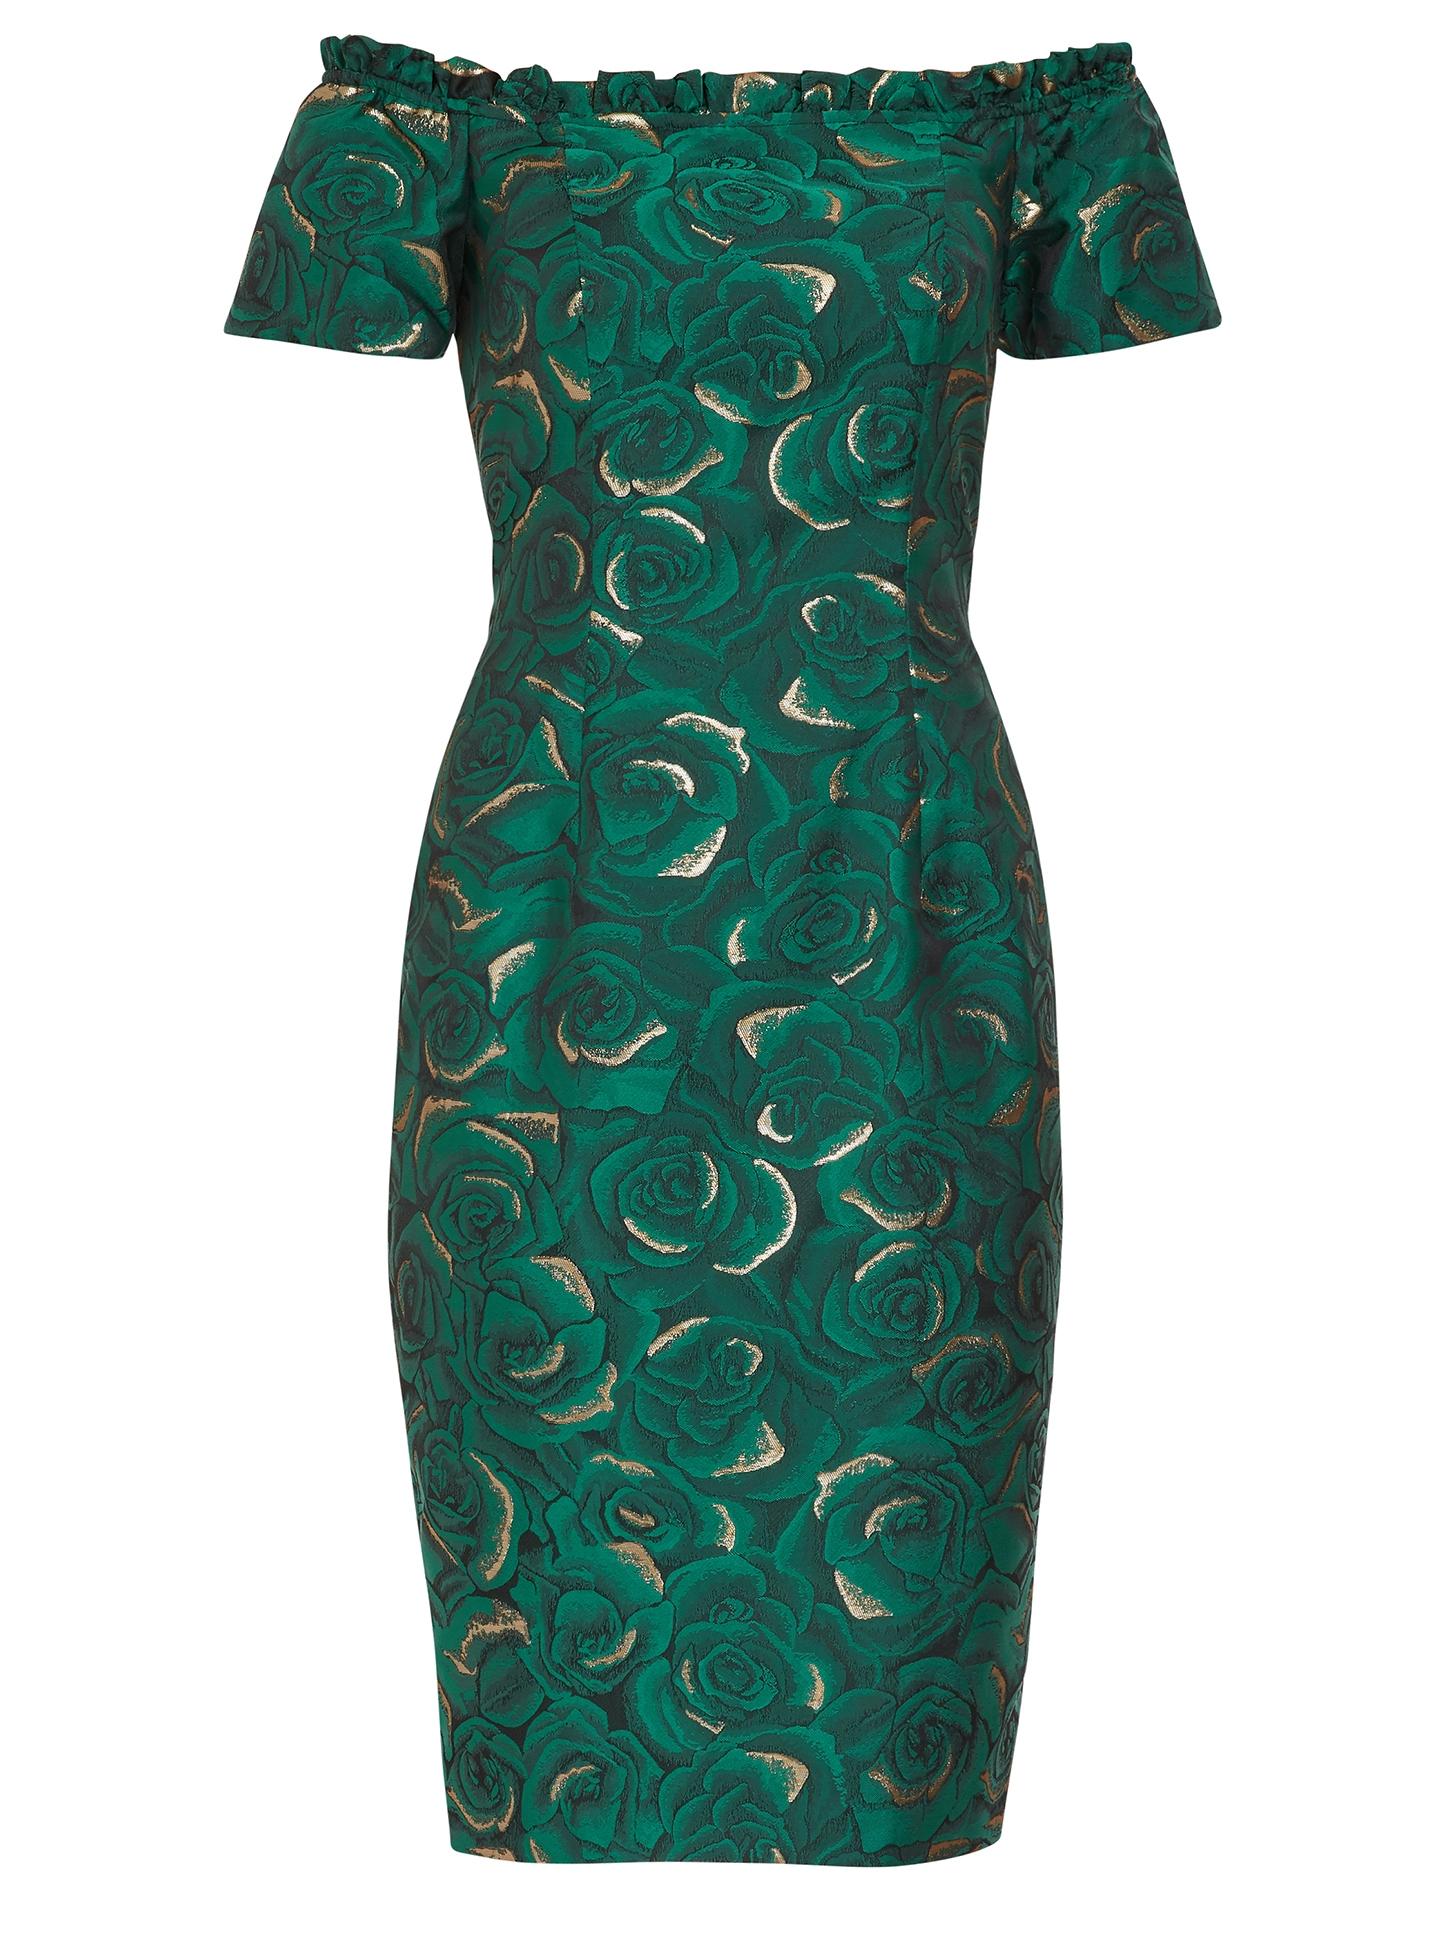 Coraima Floral Jacquard Dress